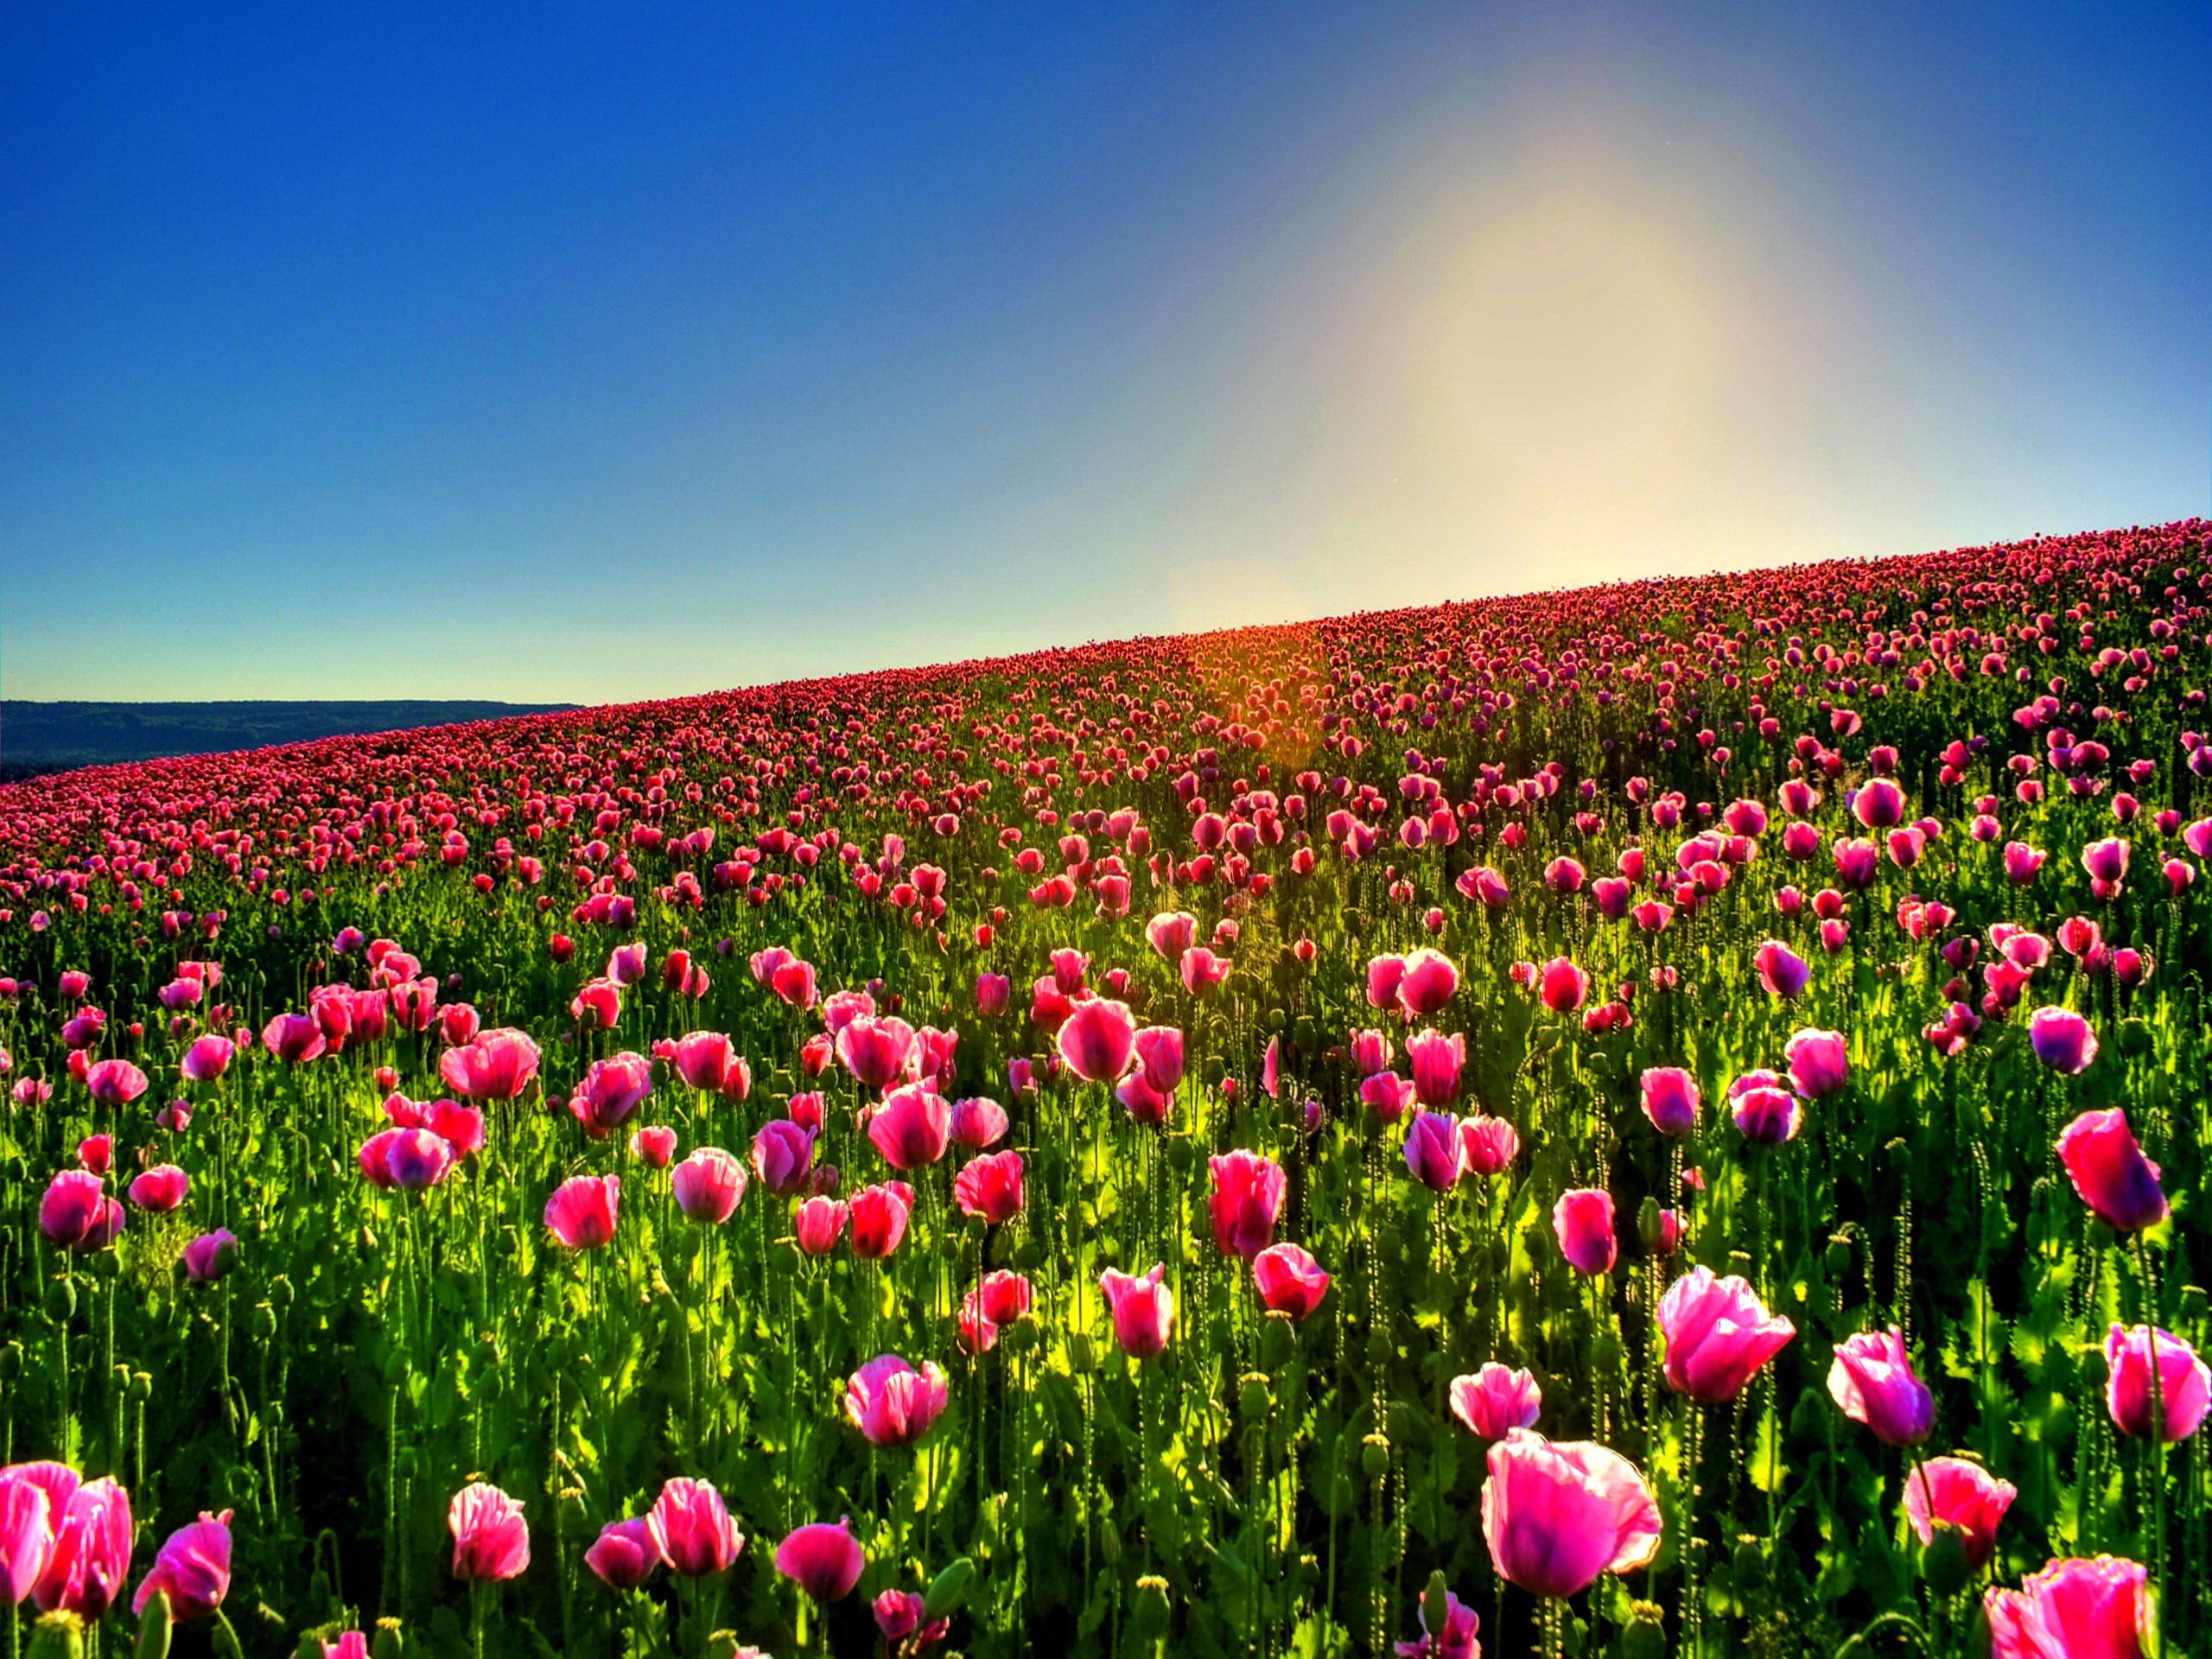 Orange Fall Peonies Wallpaper Tulip Field Hd Wallpaper 2560x1920 23638